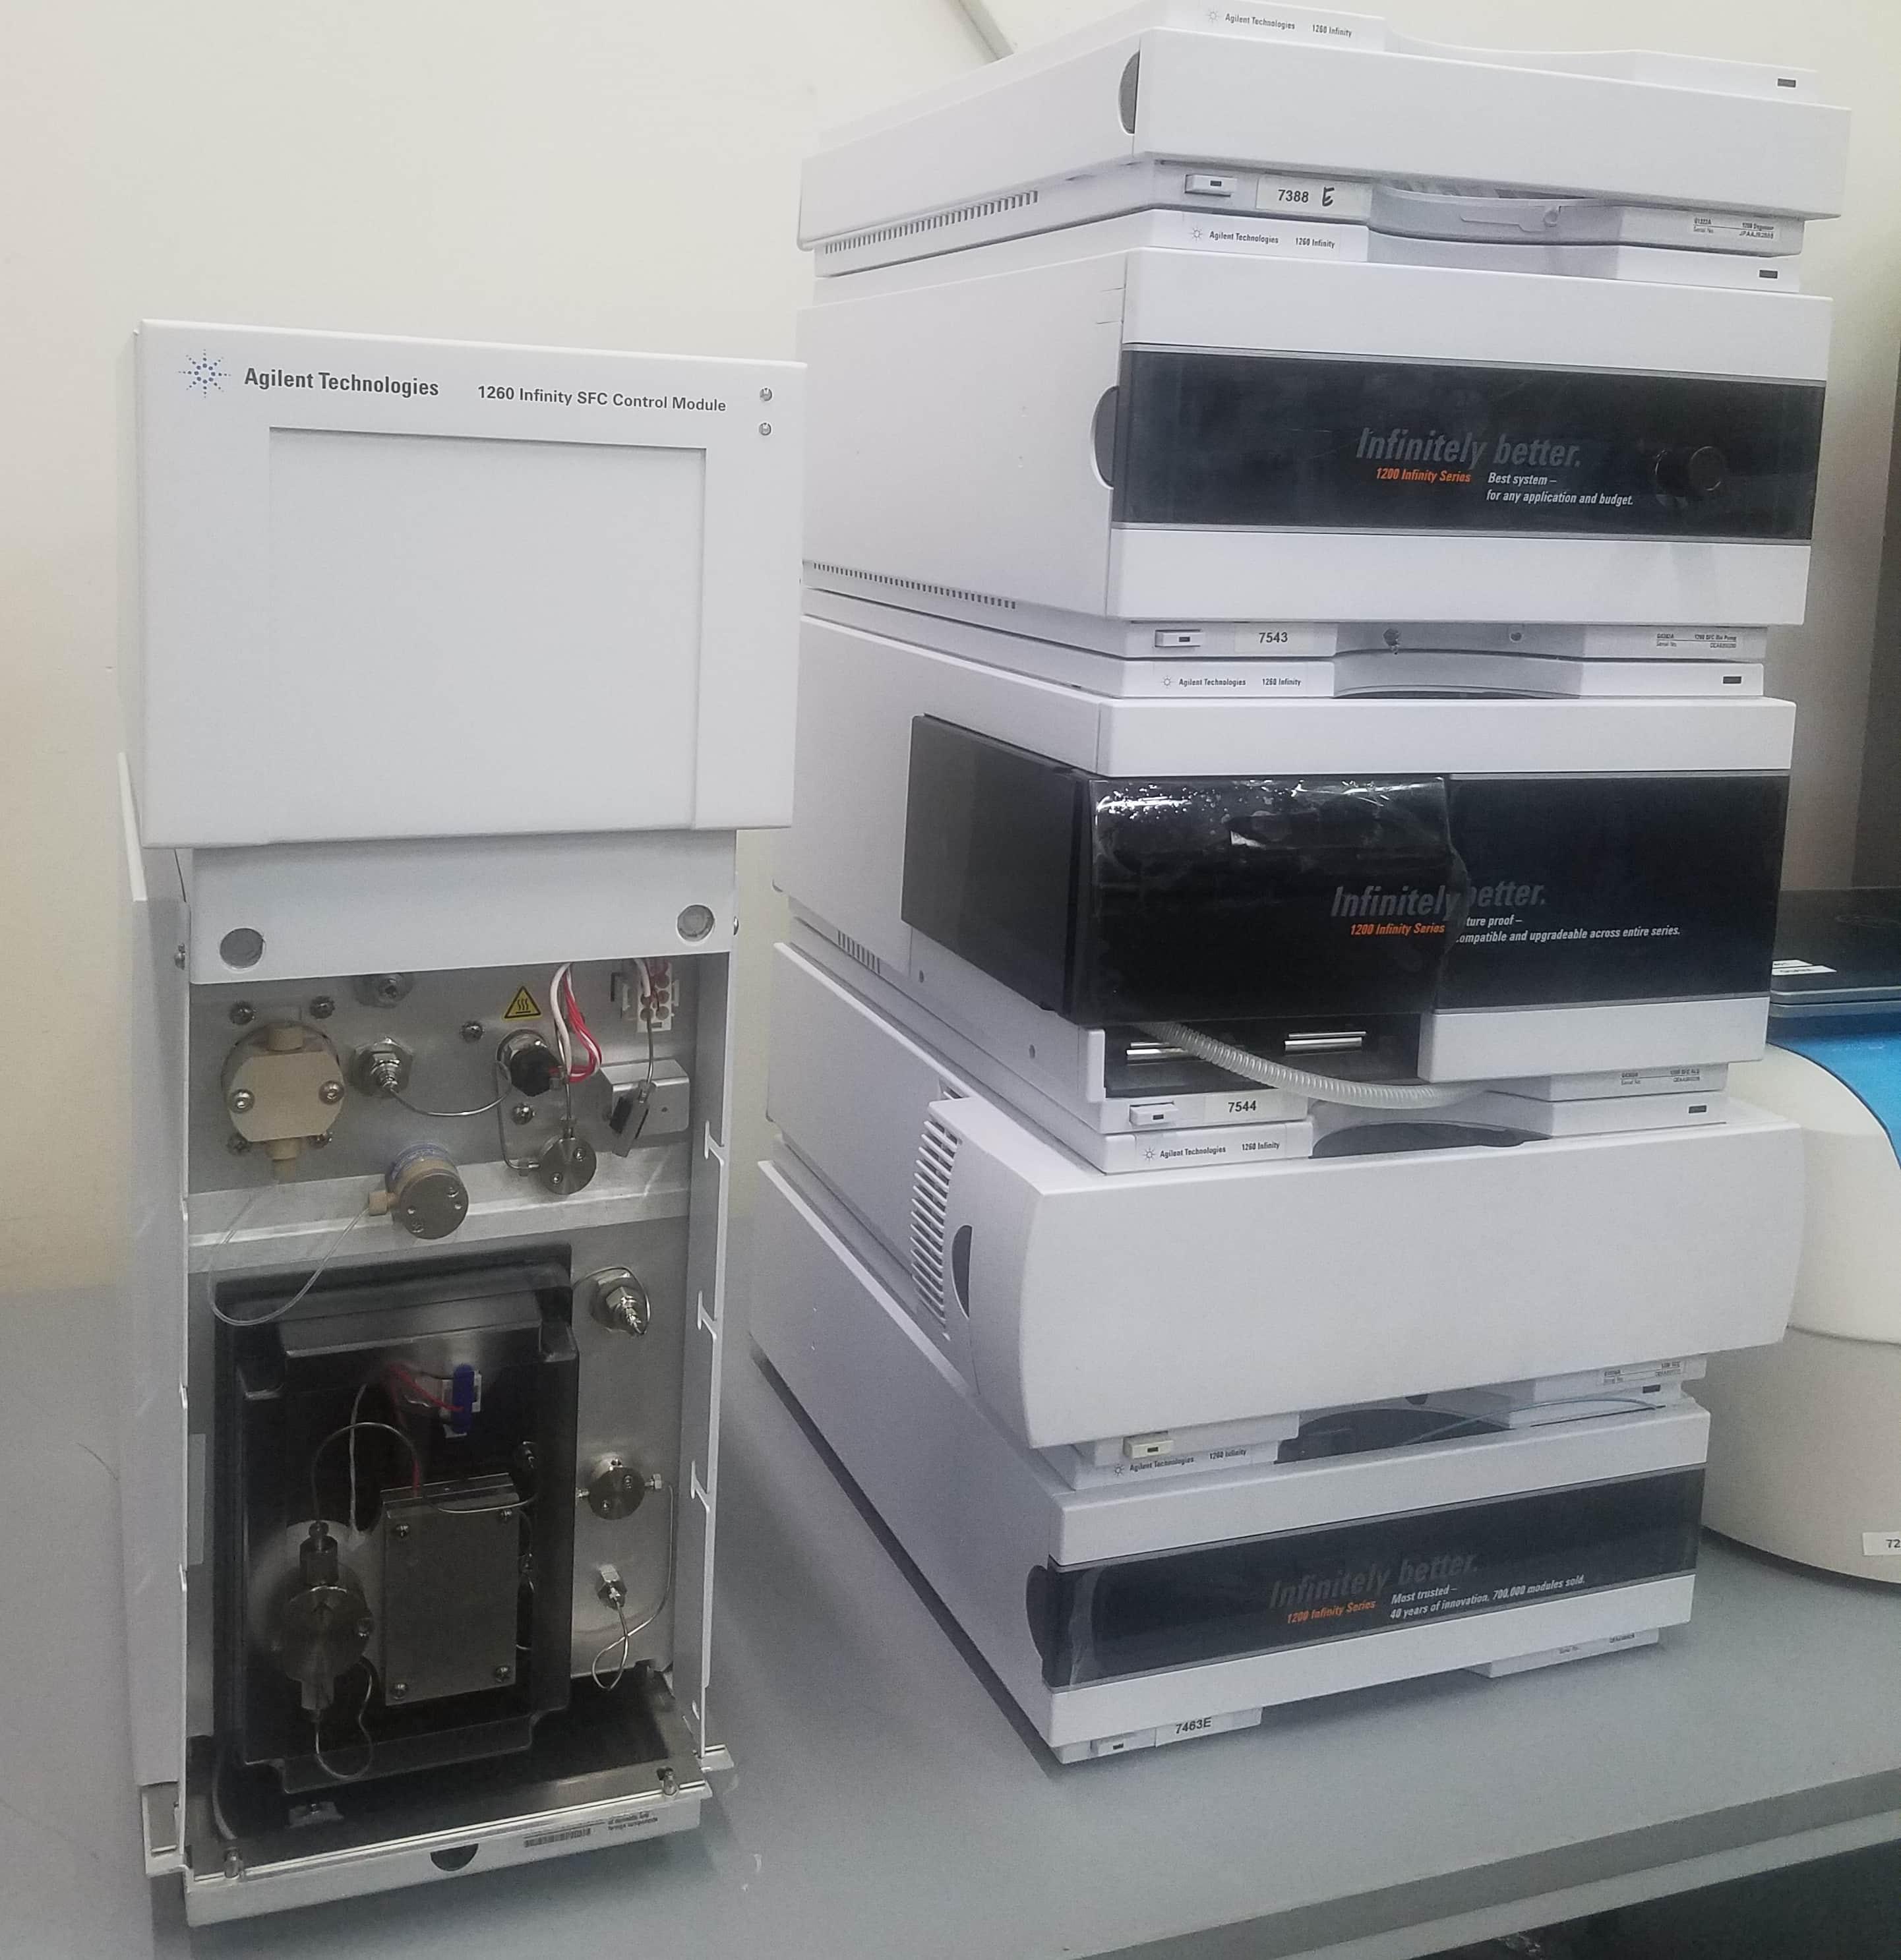 Agilent 1260 SFC Infinity System w/VWD Detector